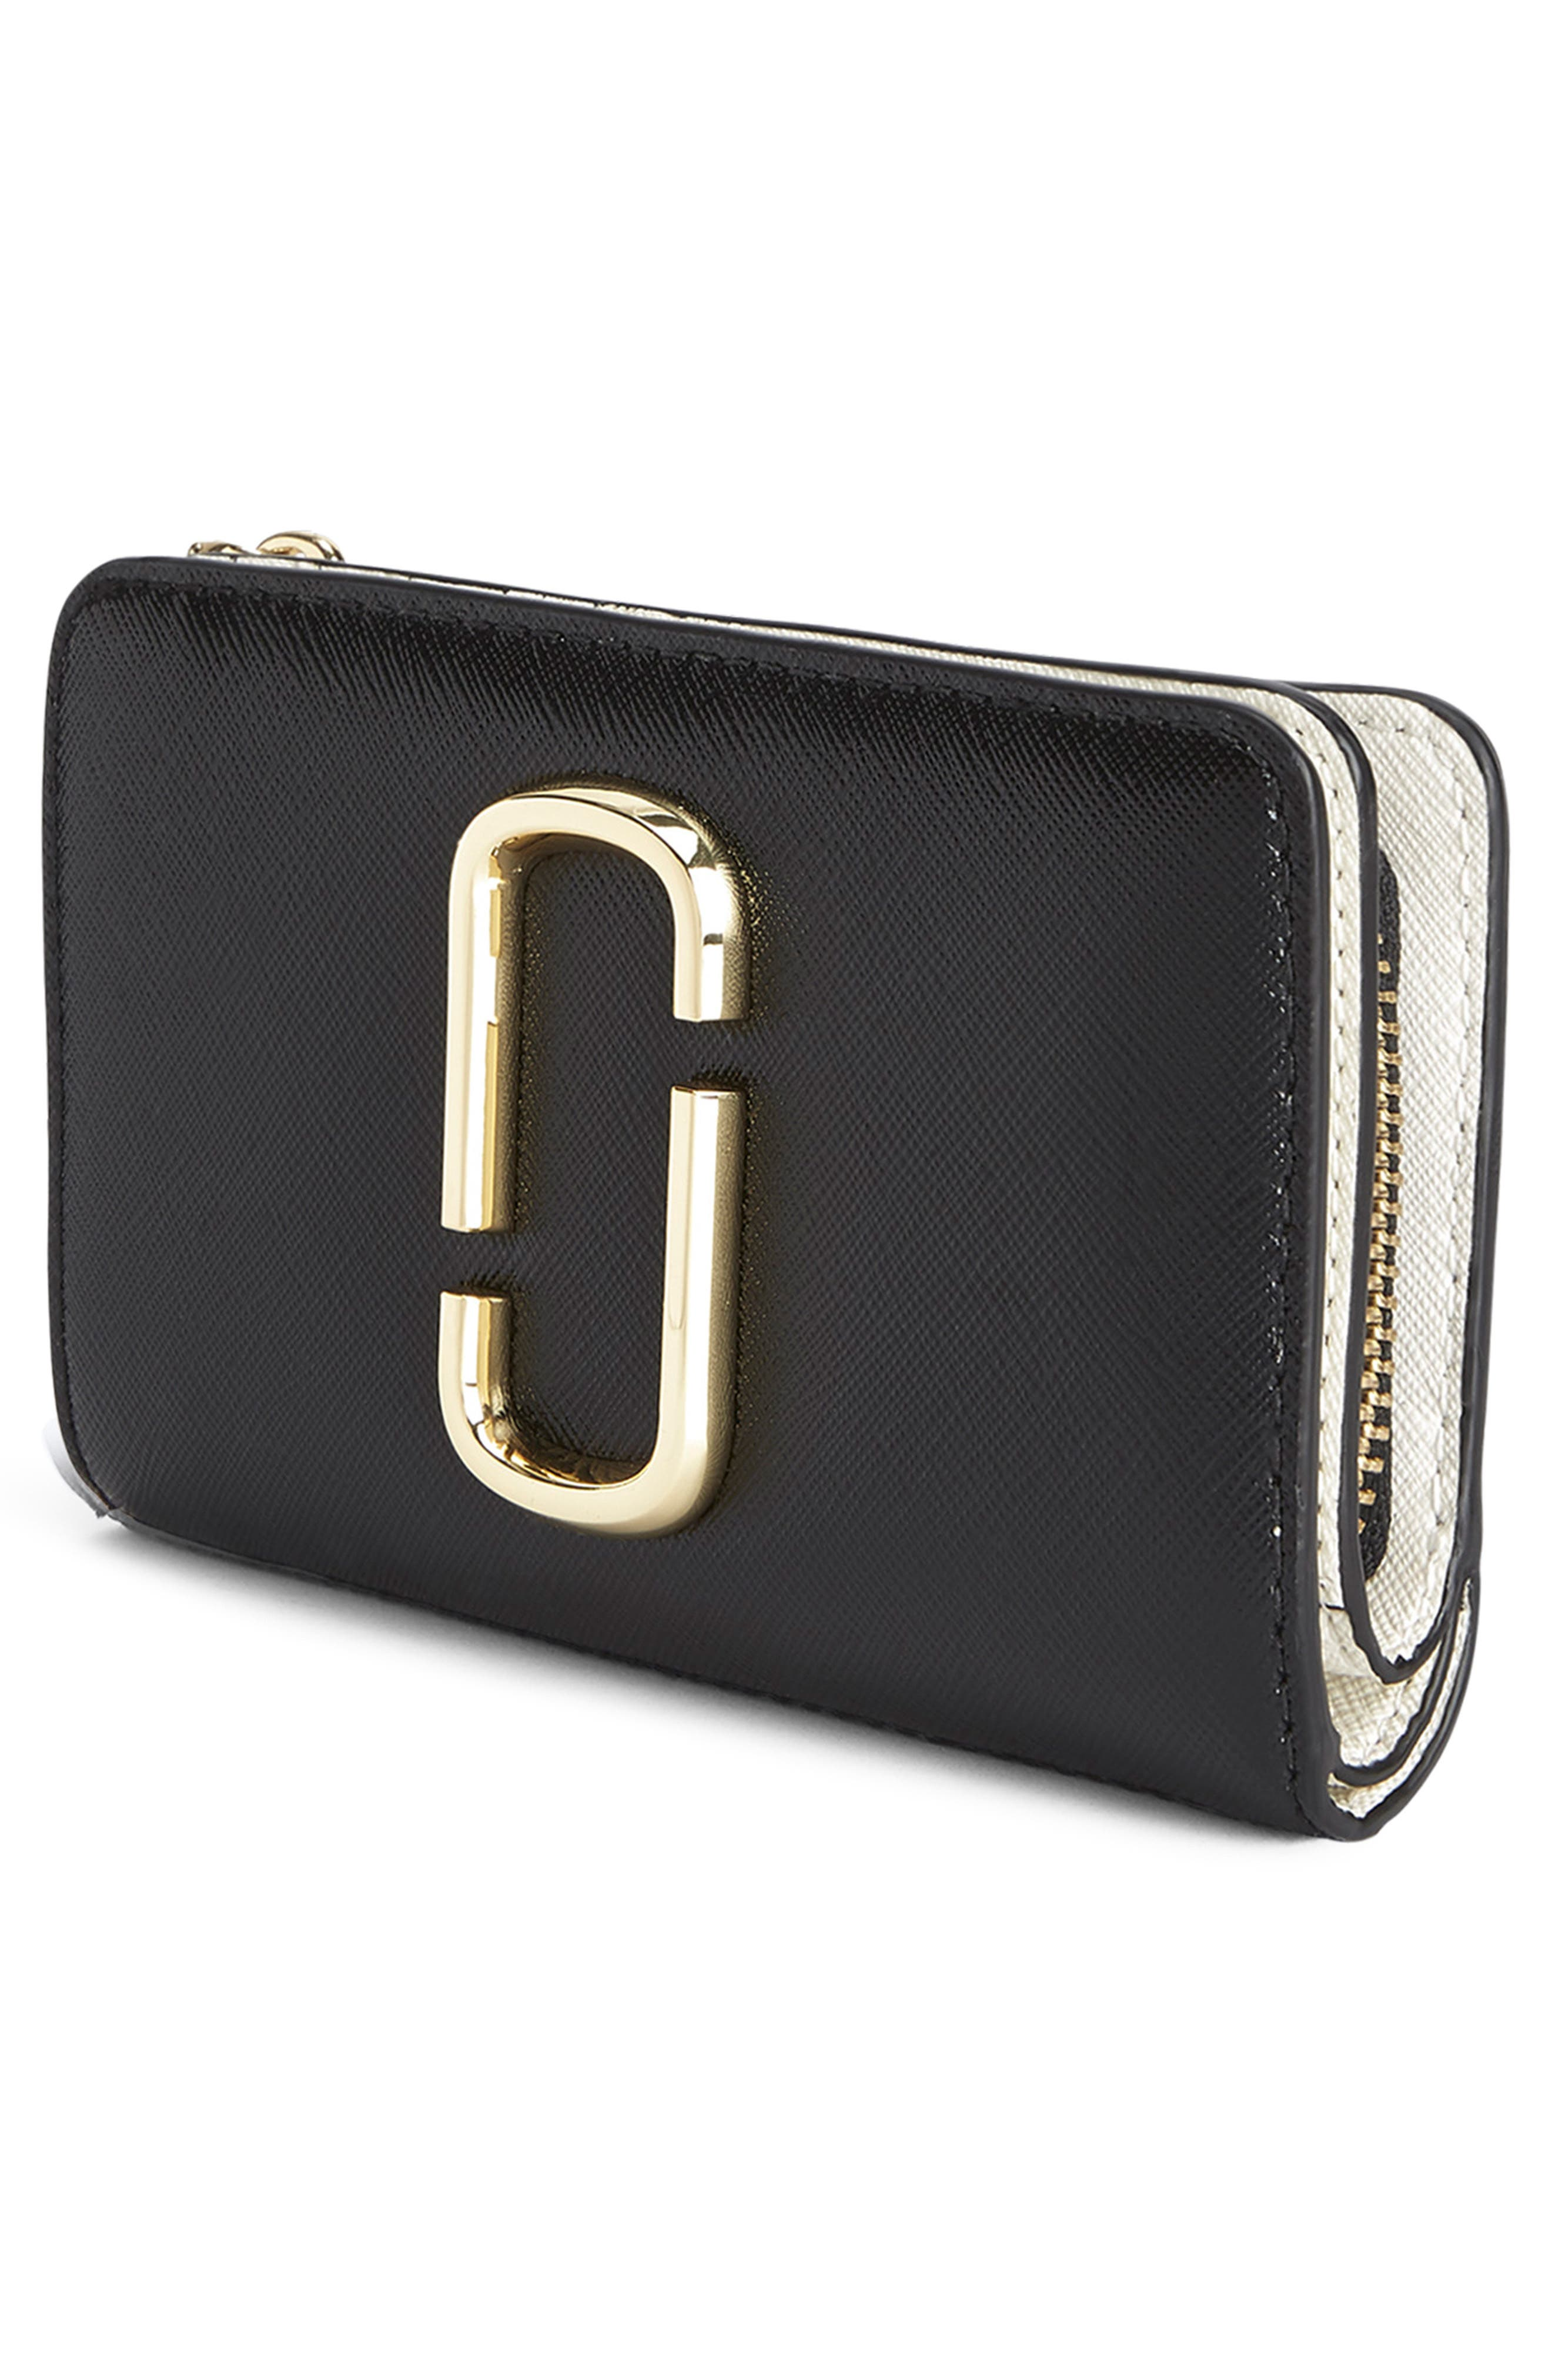 Snapshot Leather Compact Wallet,                             Alternate thumbnail 4, color,                             BLACK MULTI